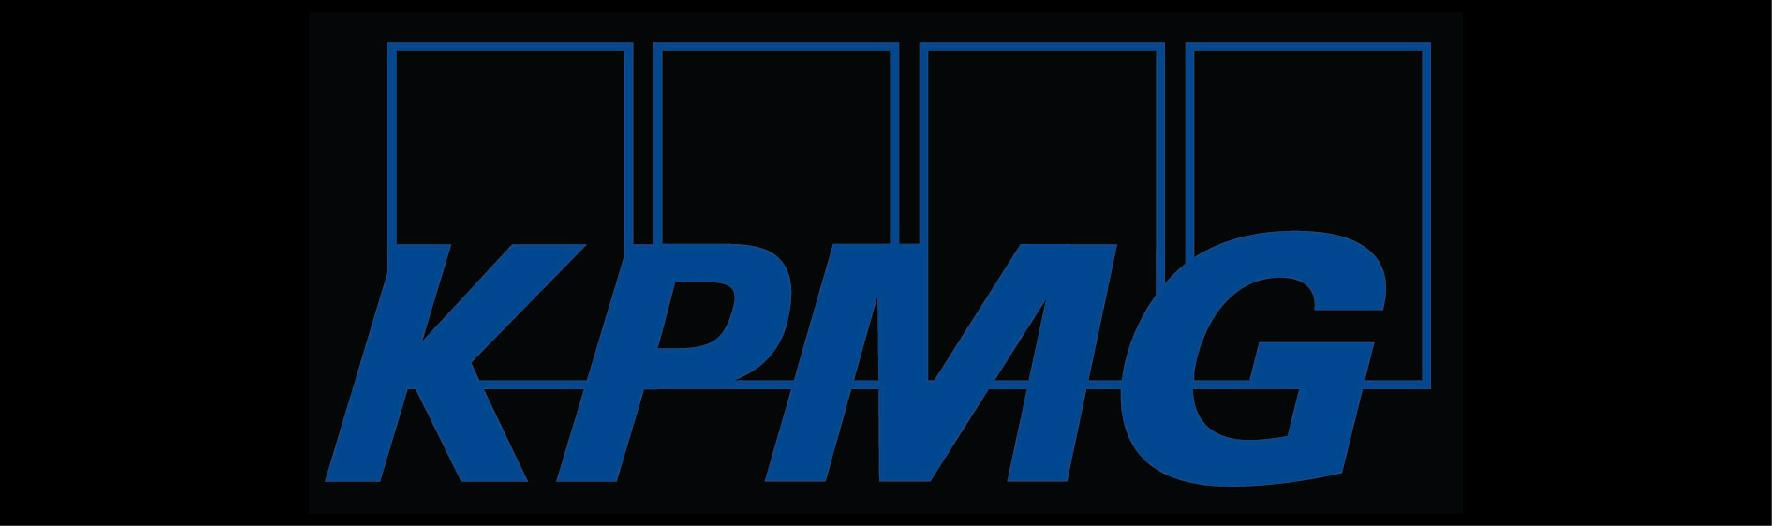 KPMG_banner